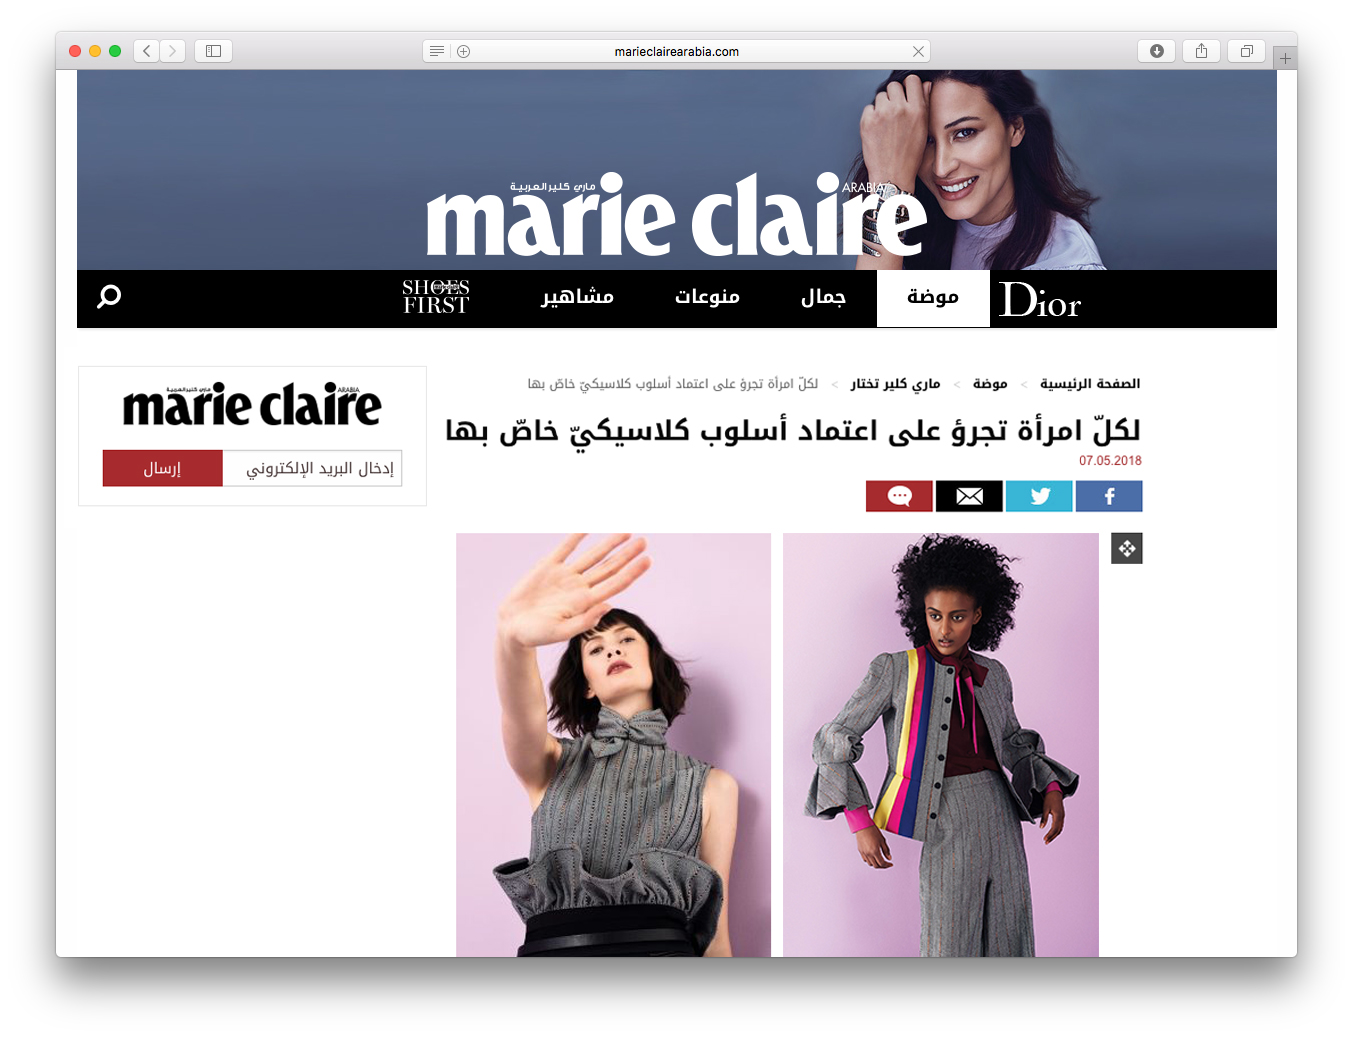 JB-AW18-INTERVIEW-MARIE-CLAIRE-ARABIA.jpg